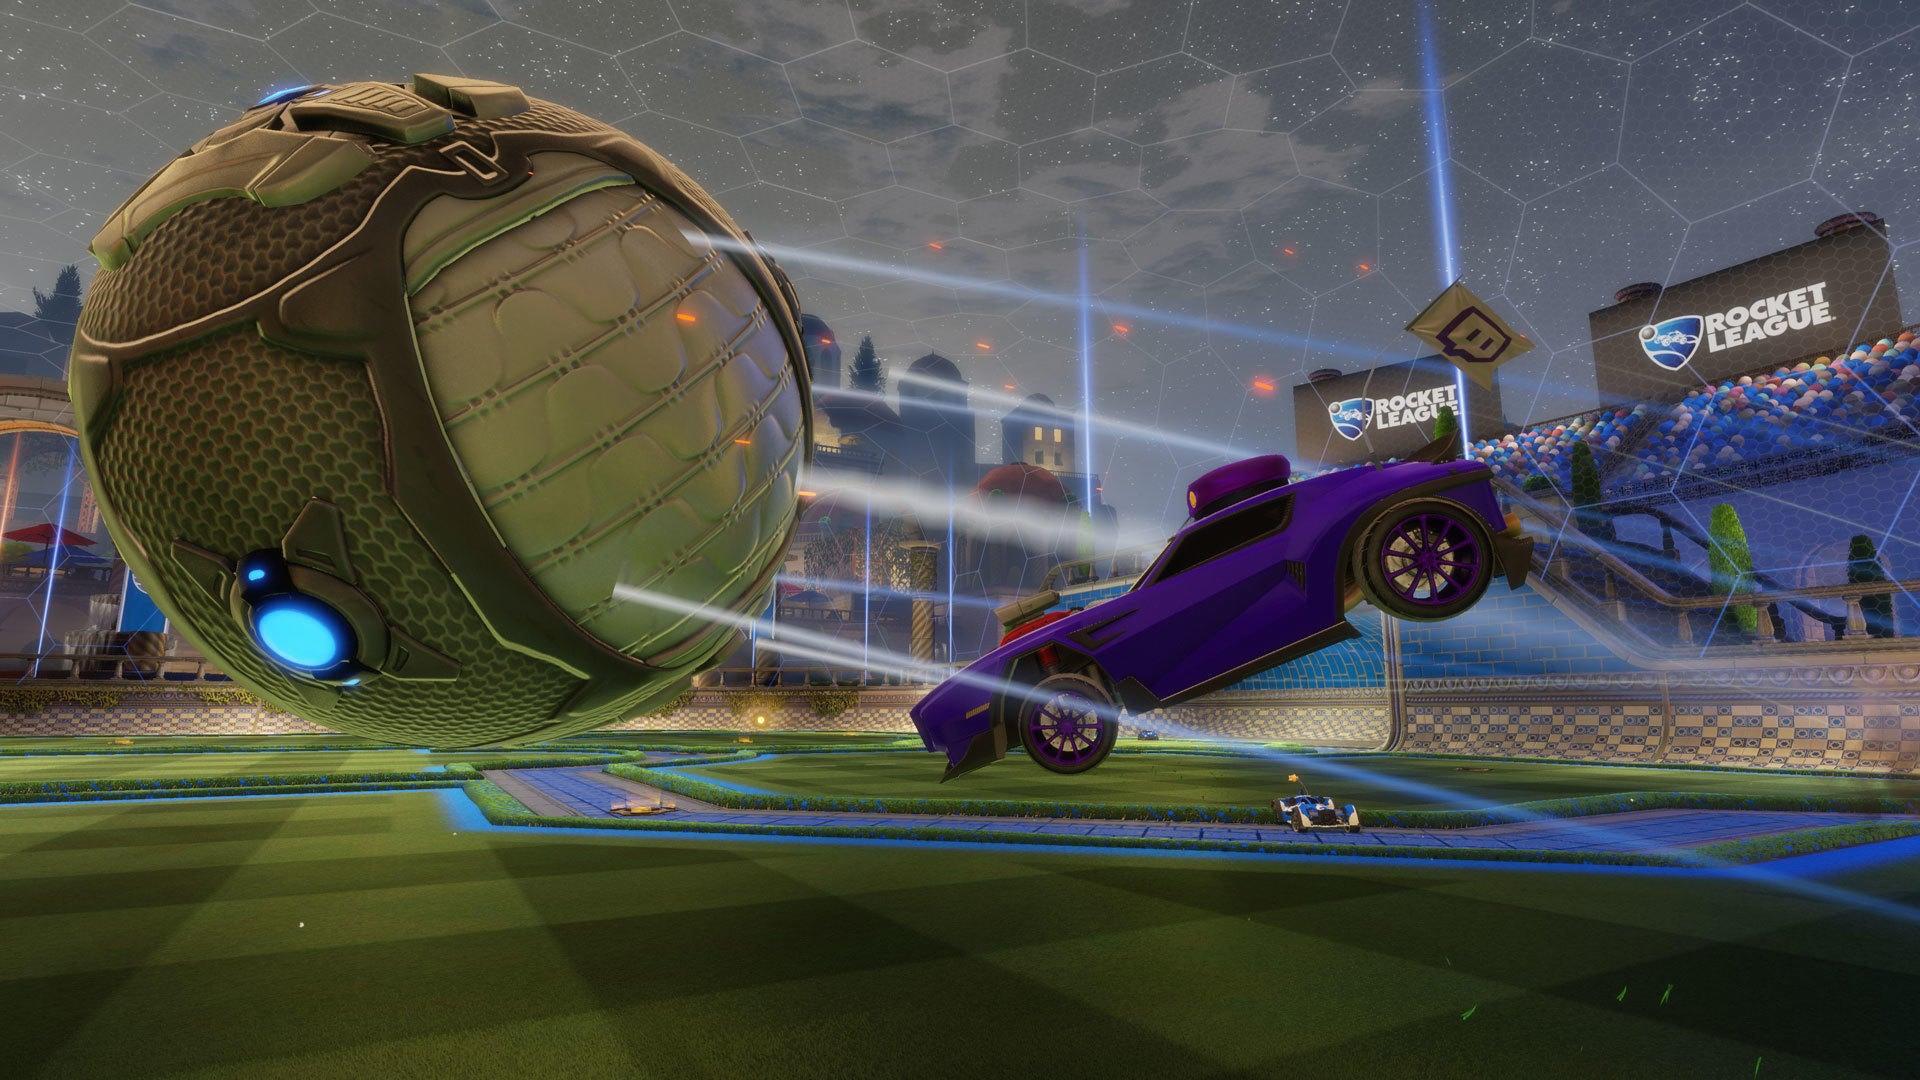 Rocket League at TwitchCon 2016 Image